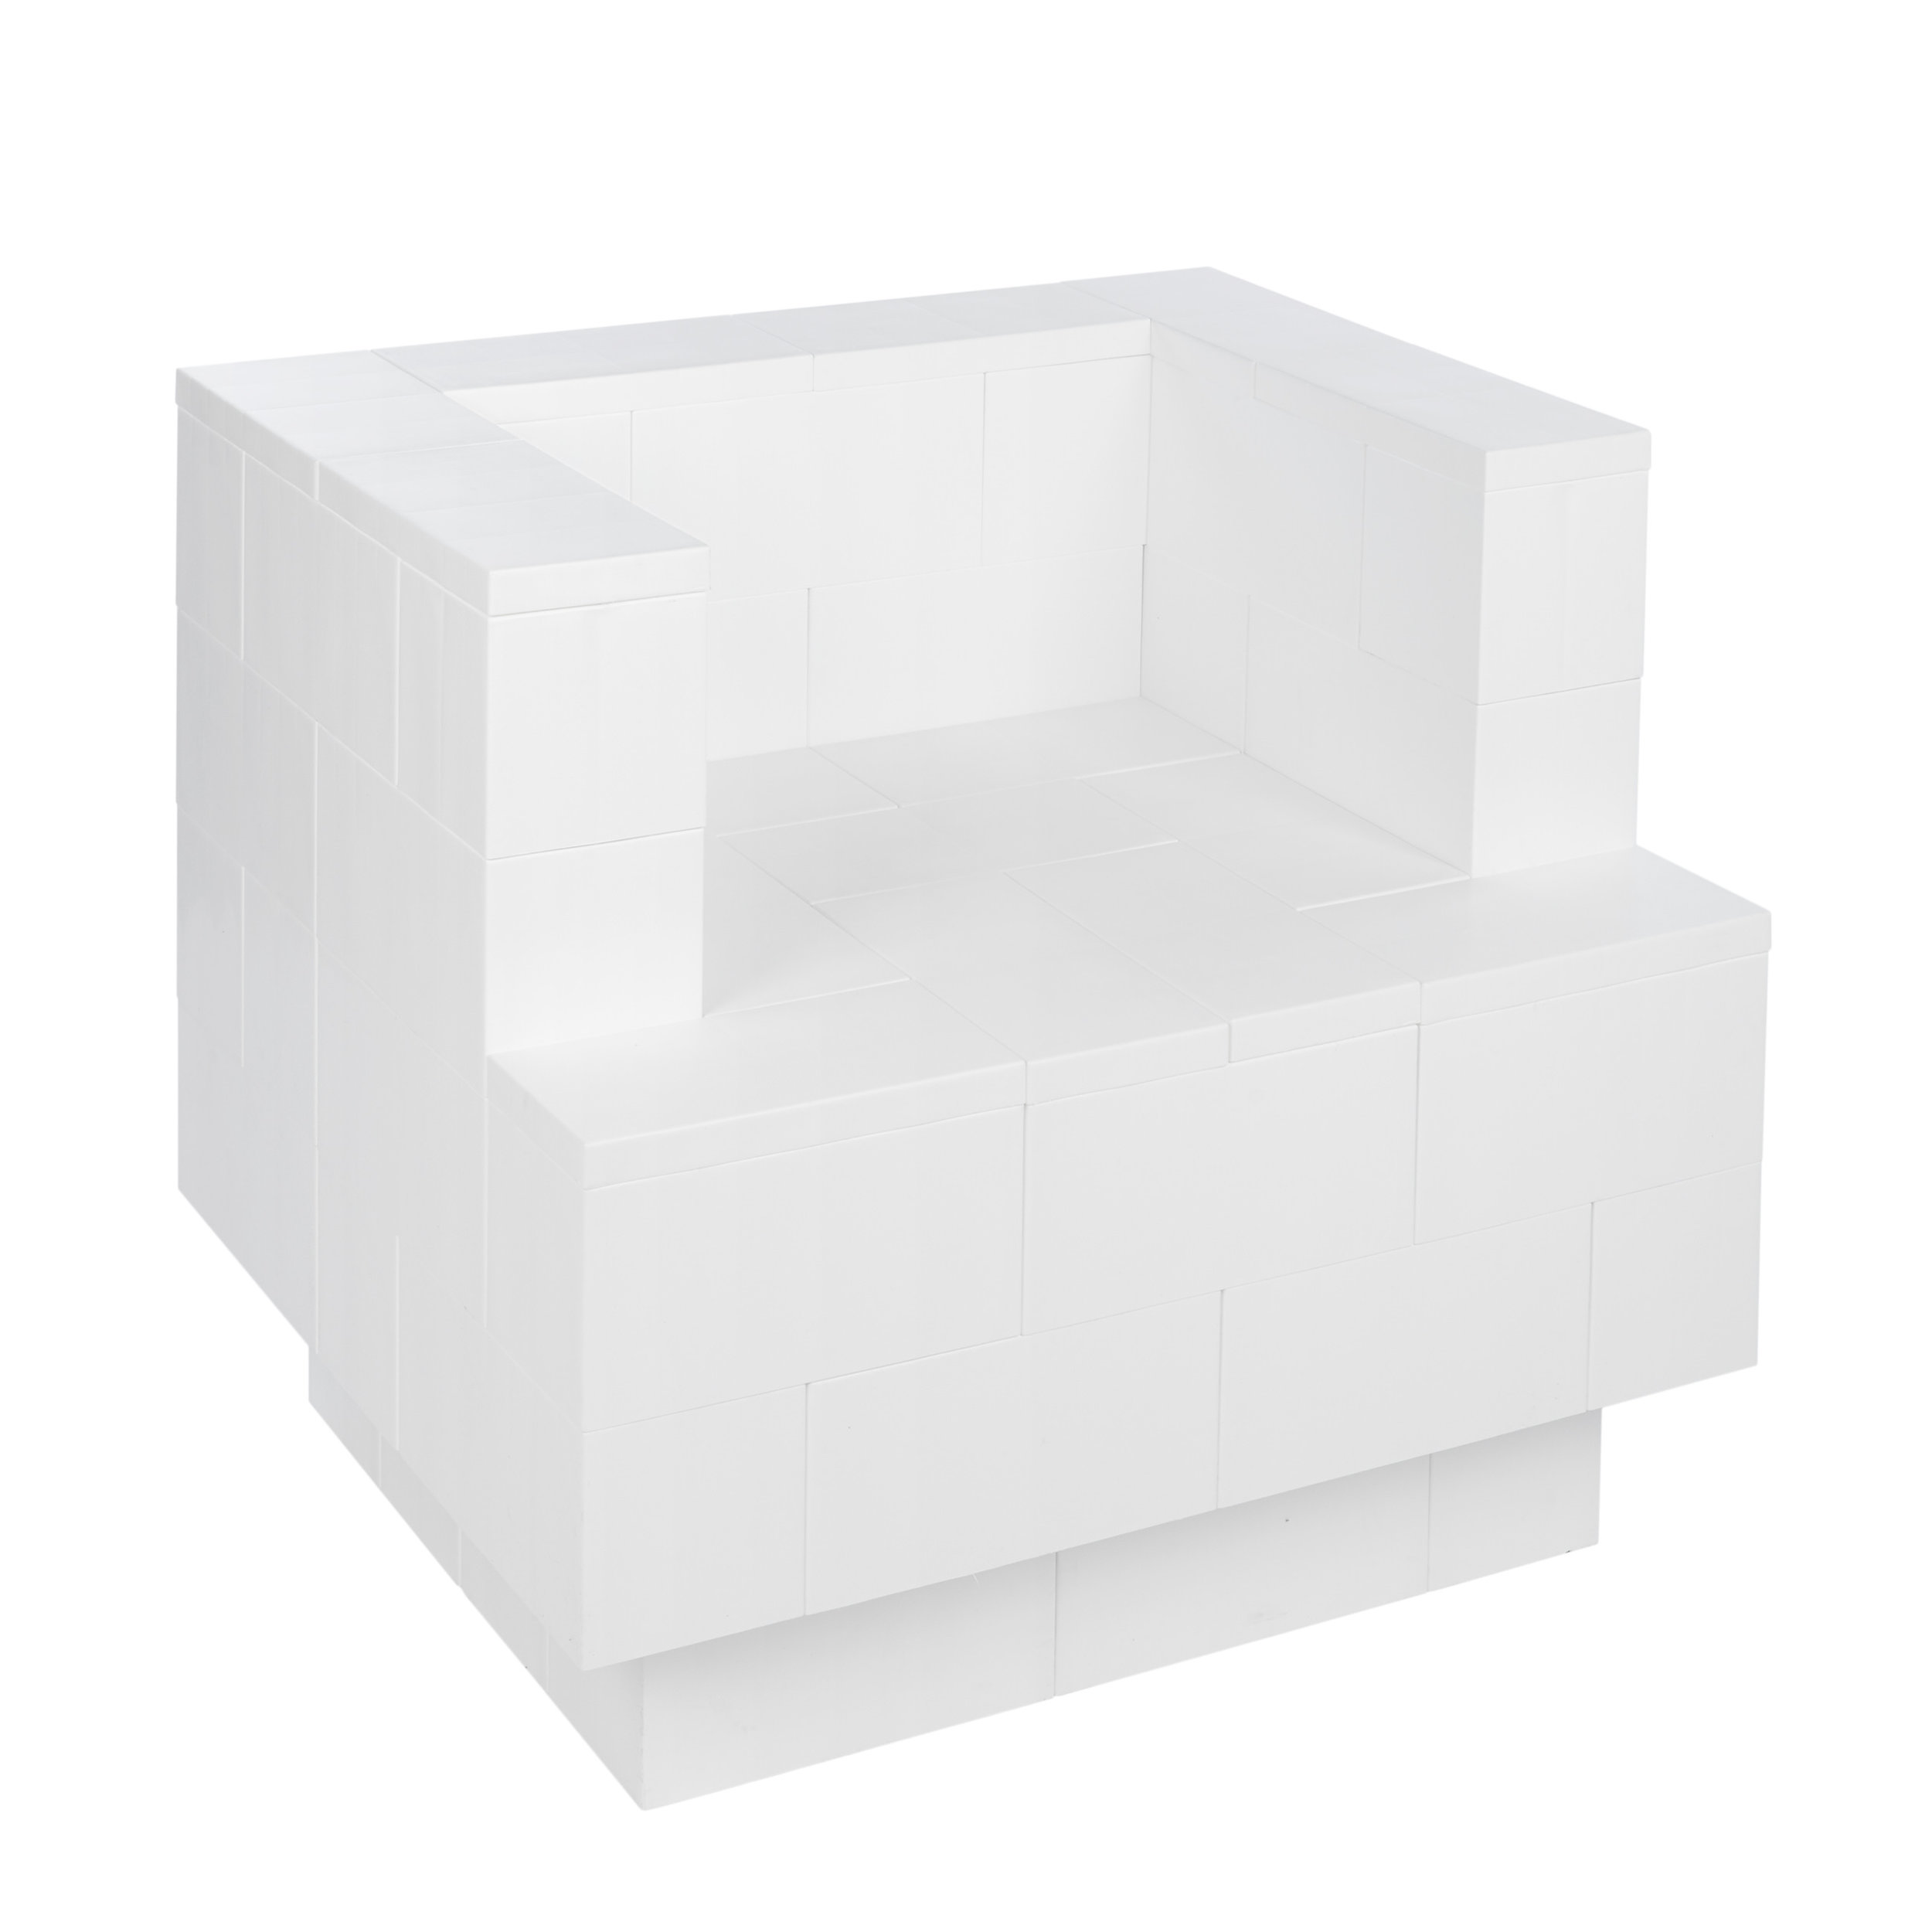 Seating Kits